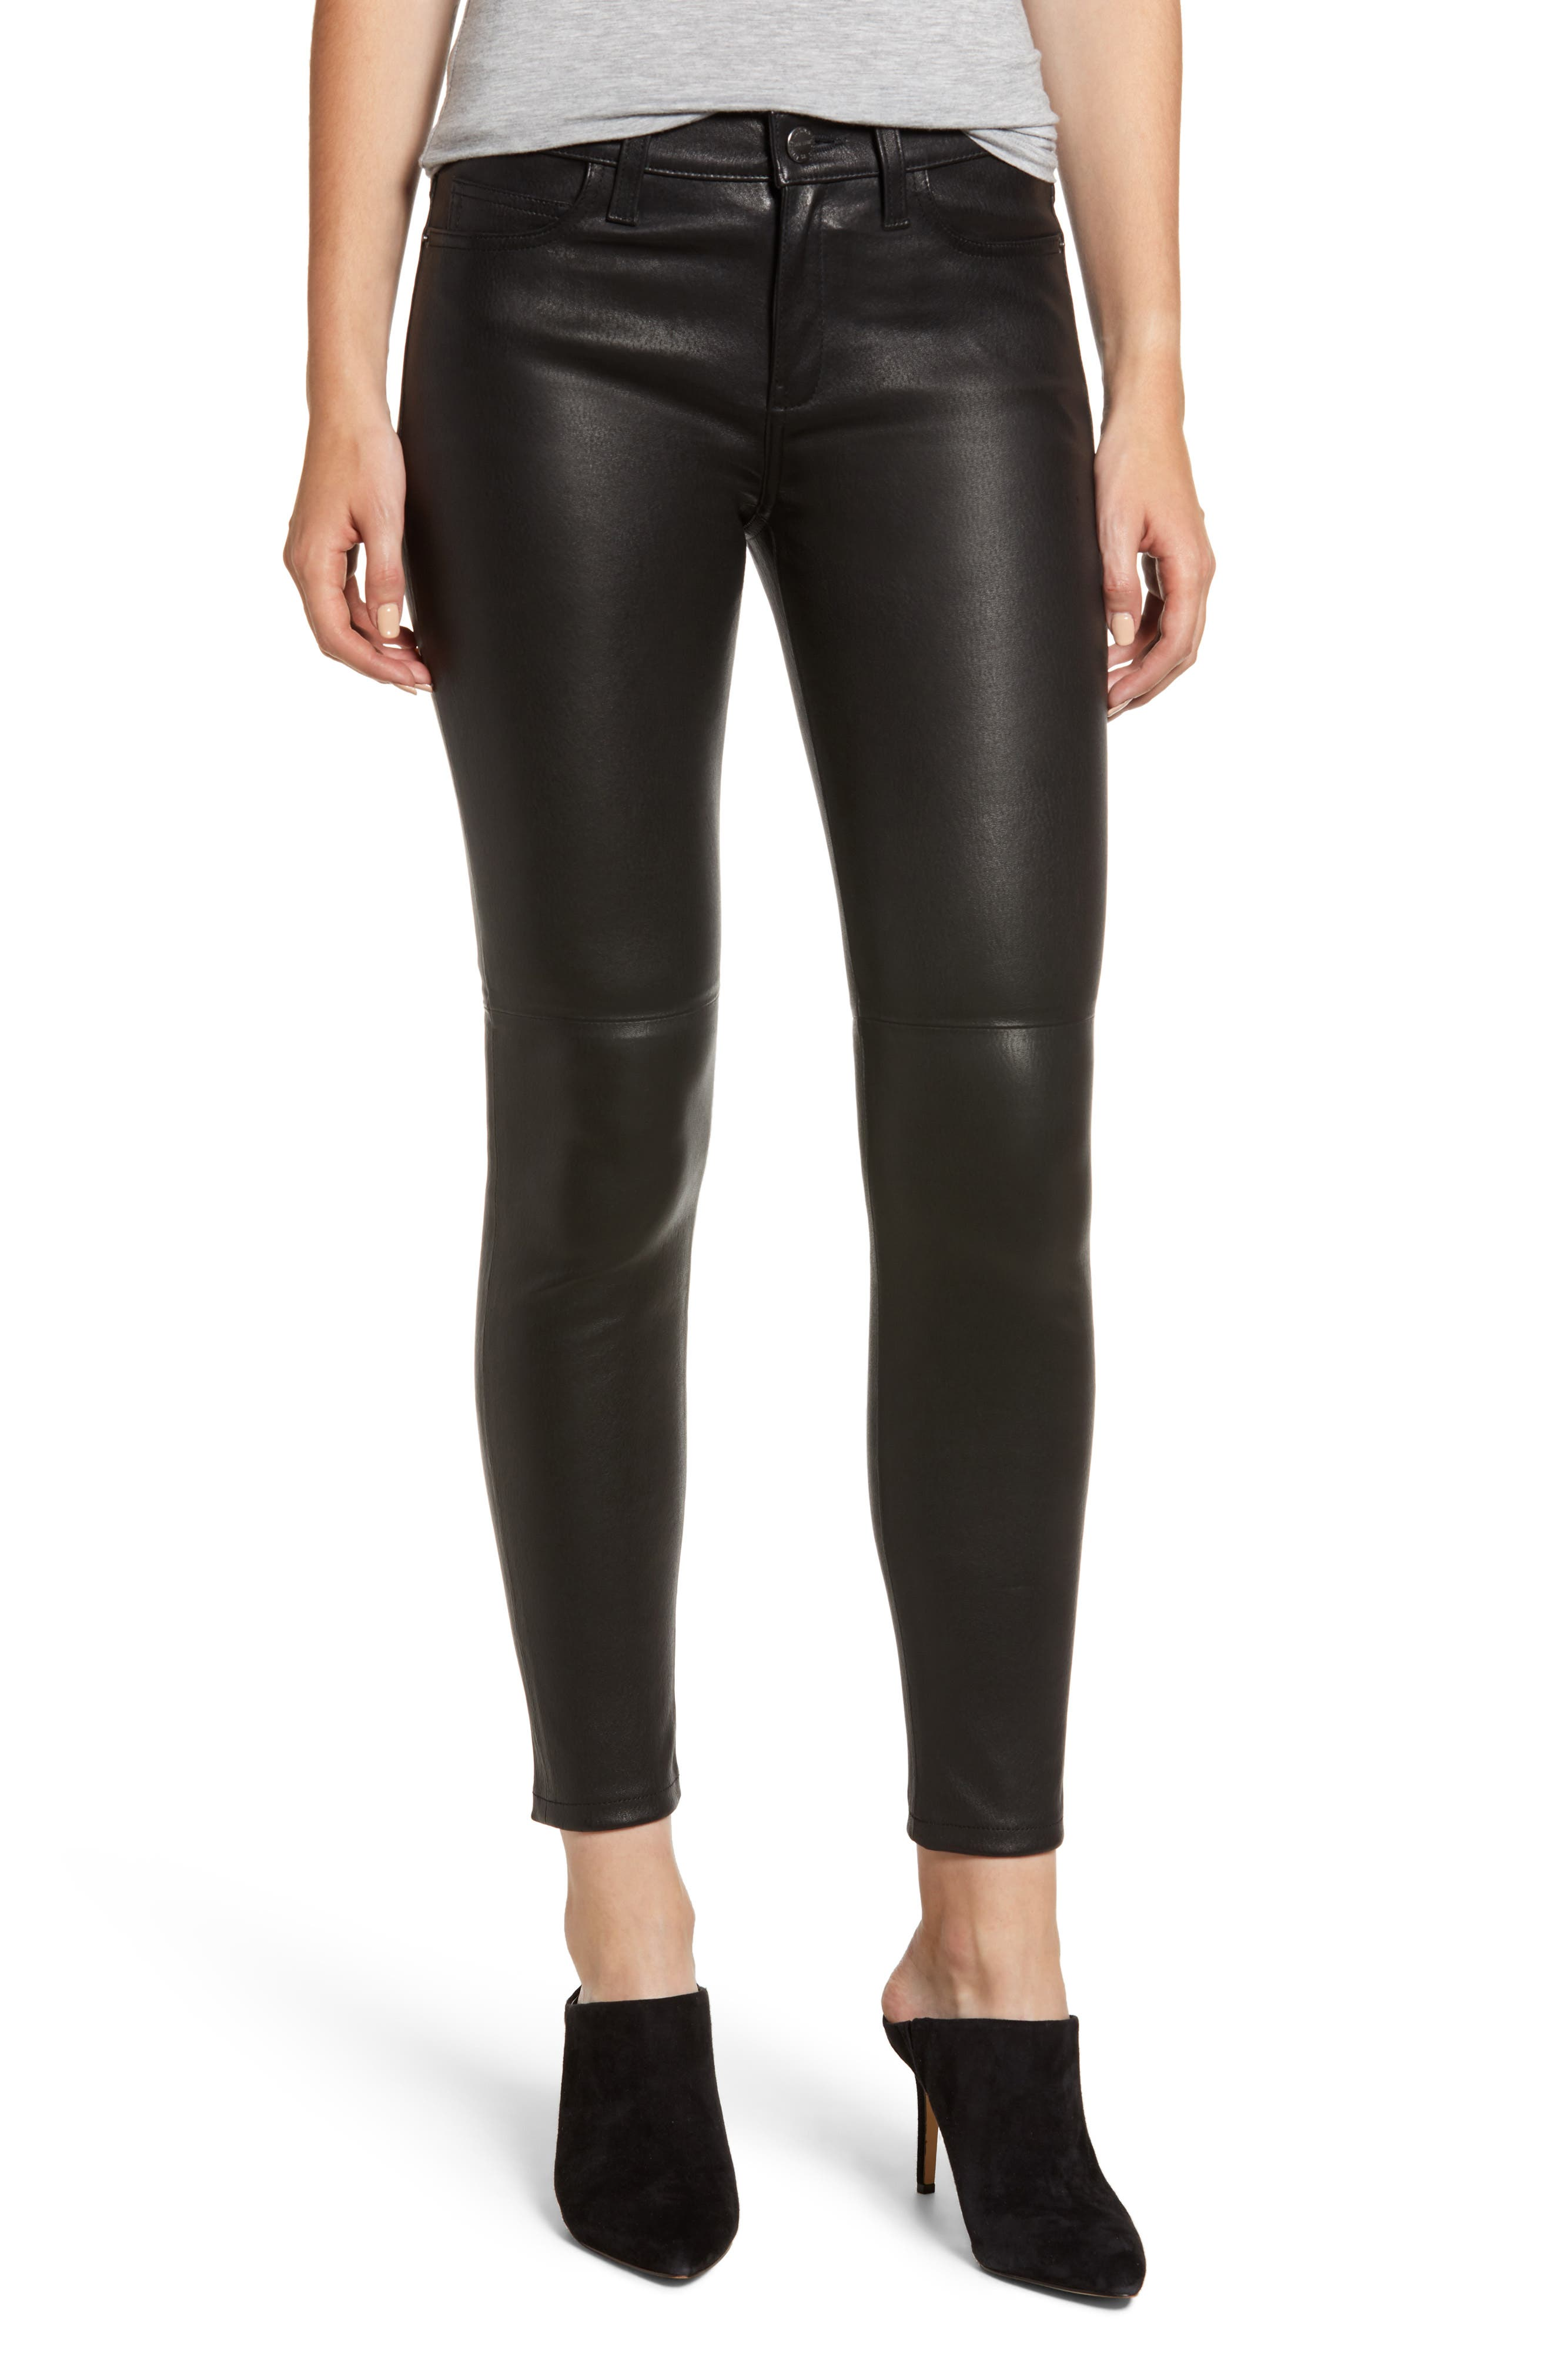 CURRENT ELLIOTT The Stiletto Ankle Skinny Lambskin Leather Pants in Black